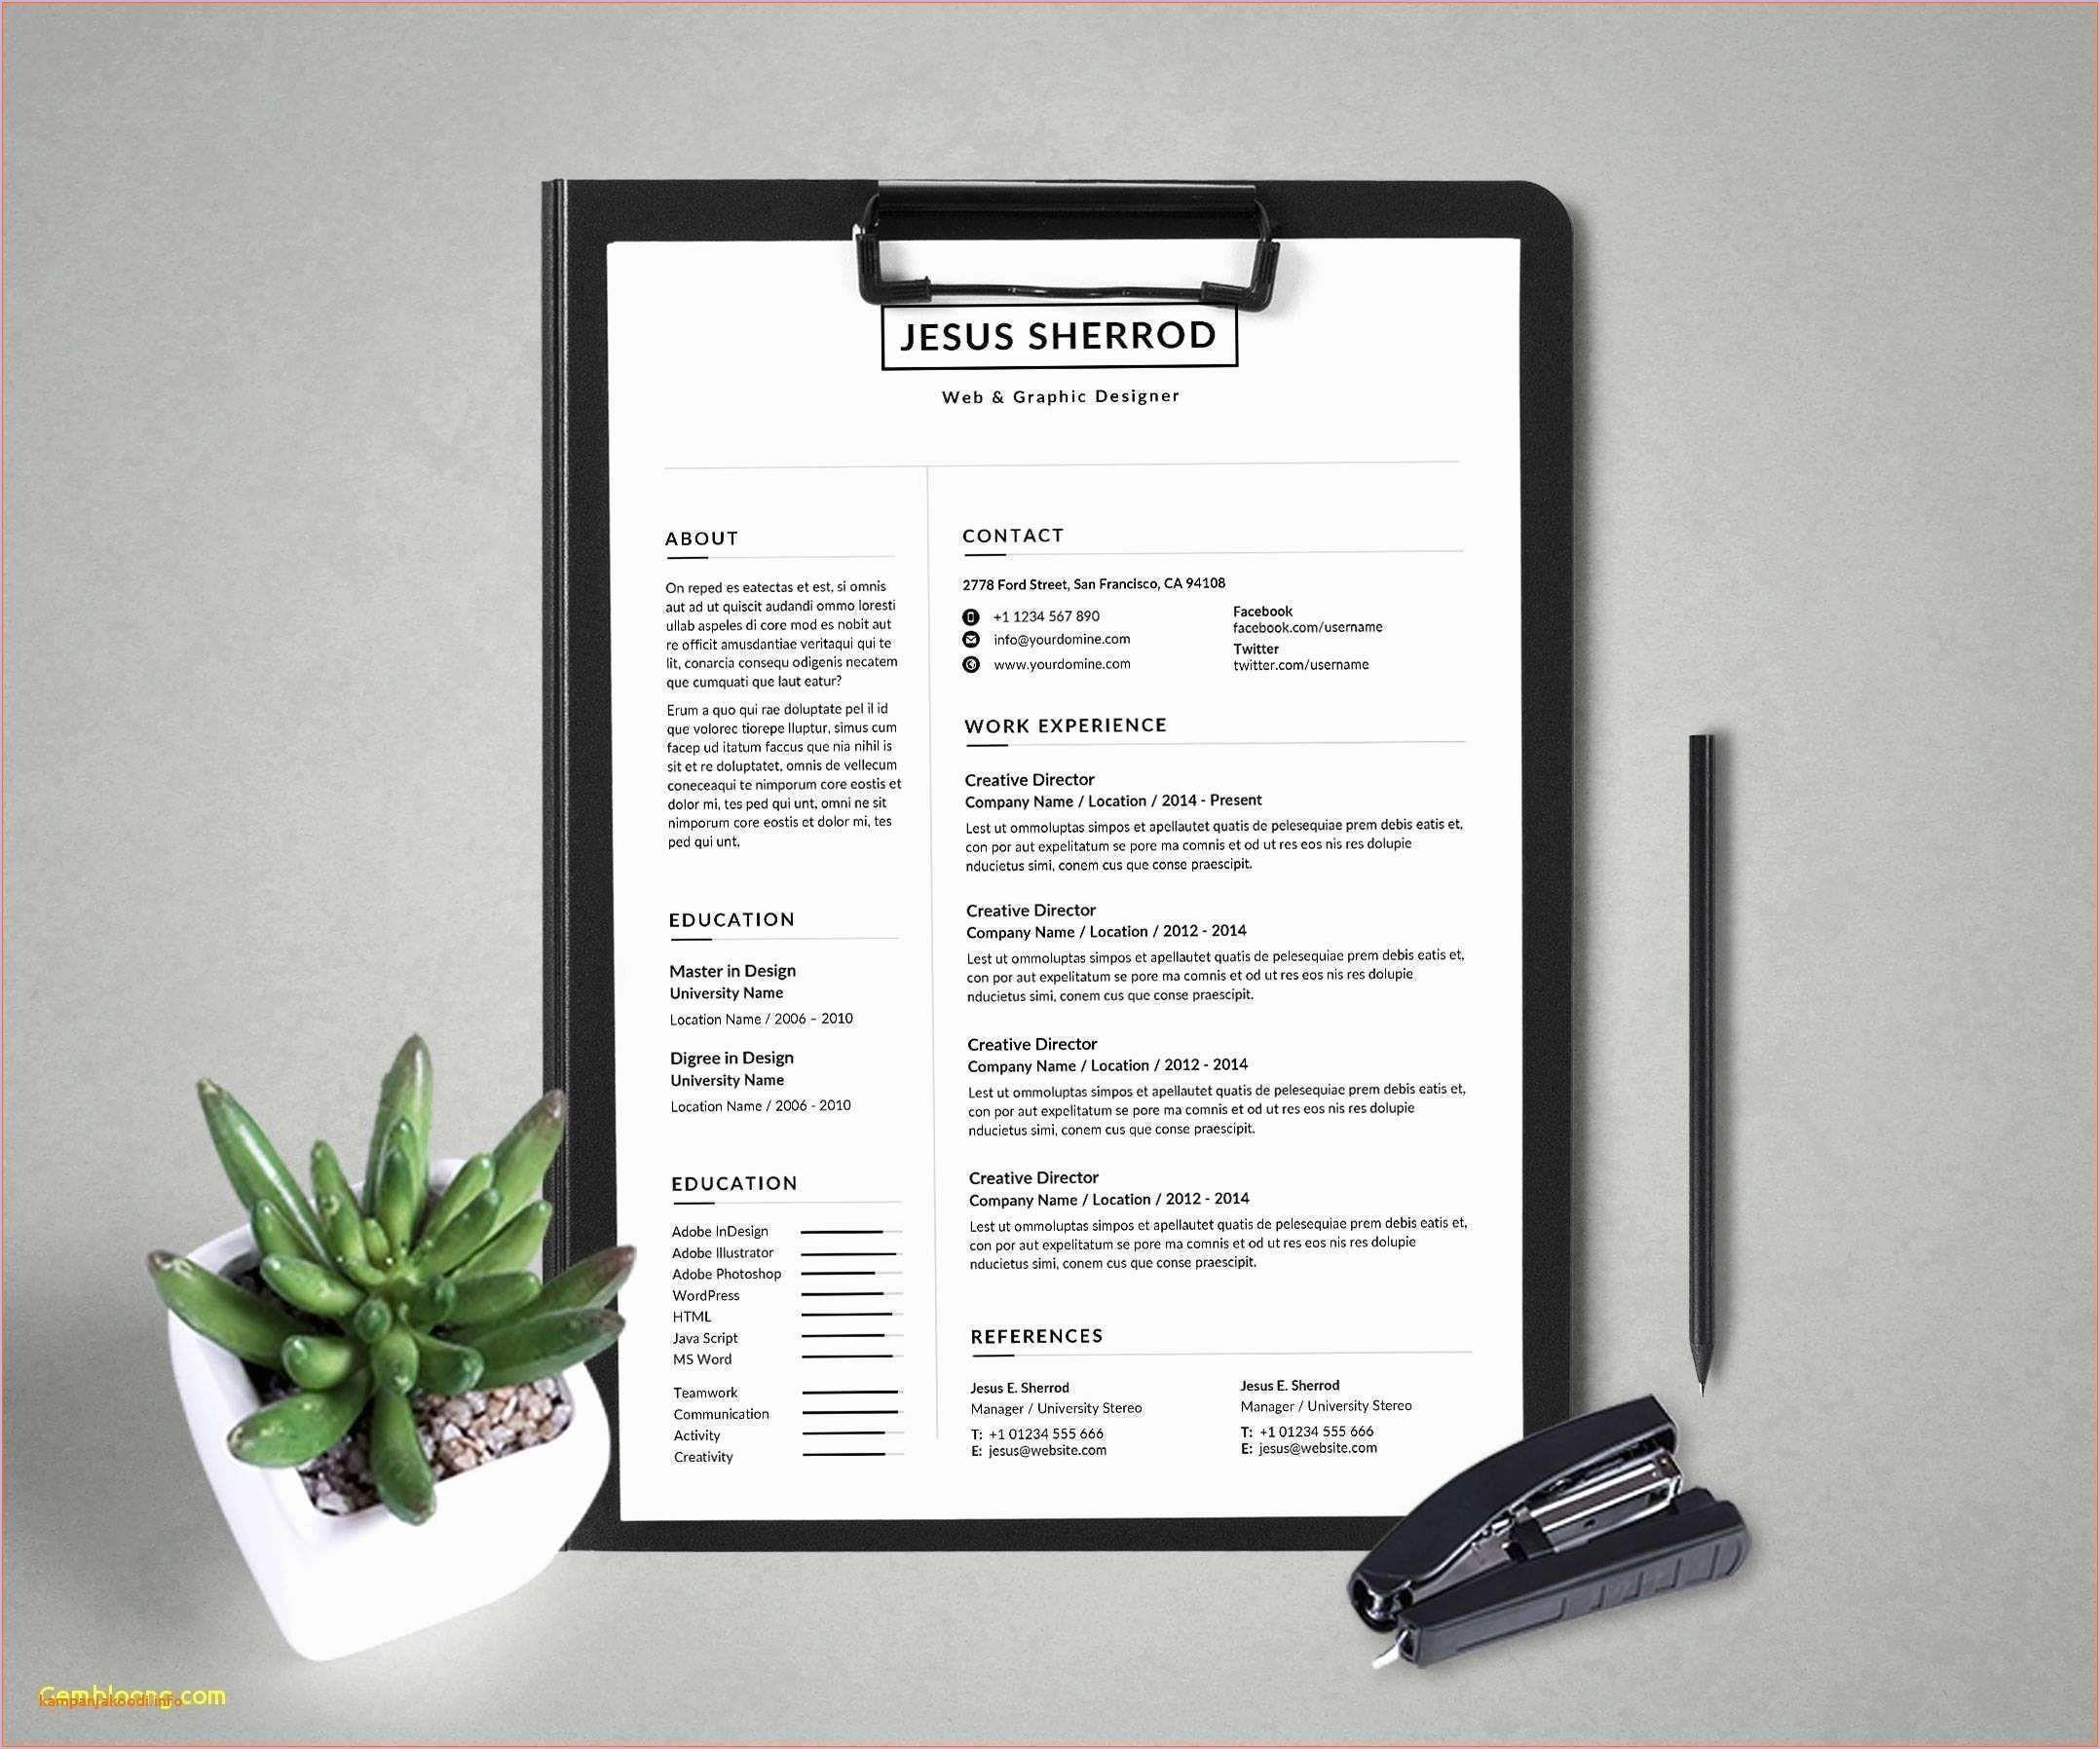 Elon musk resume template new elon musk resume template